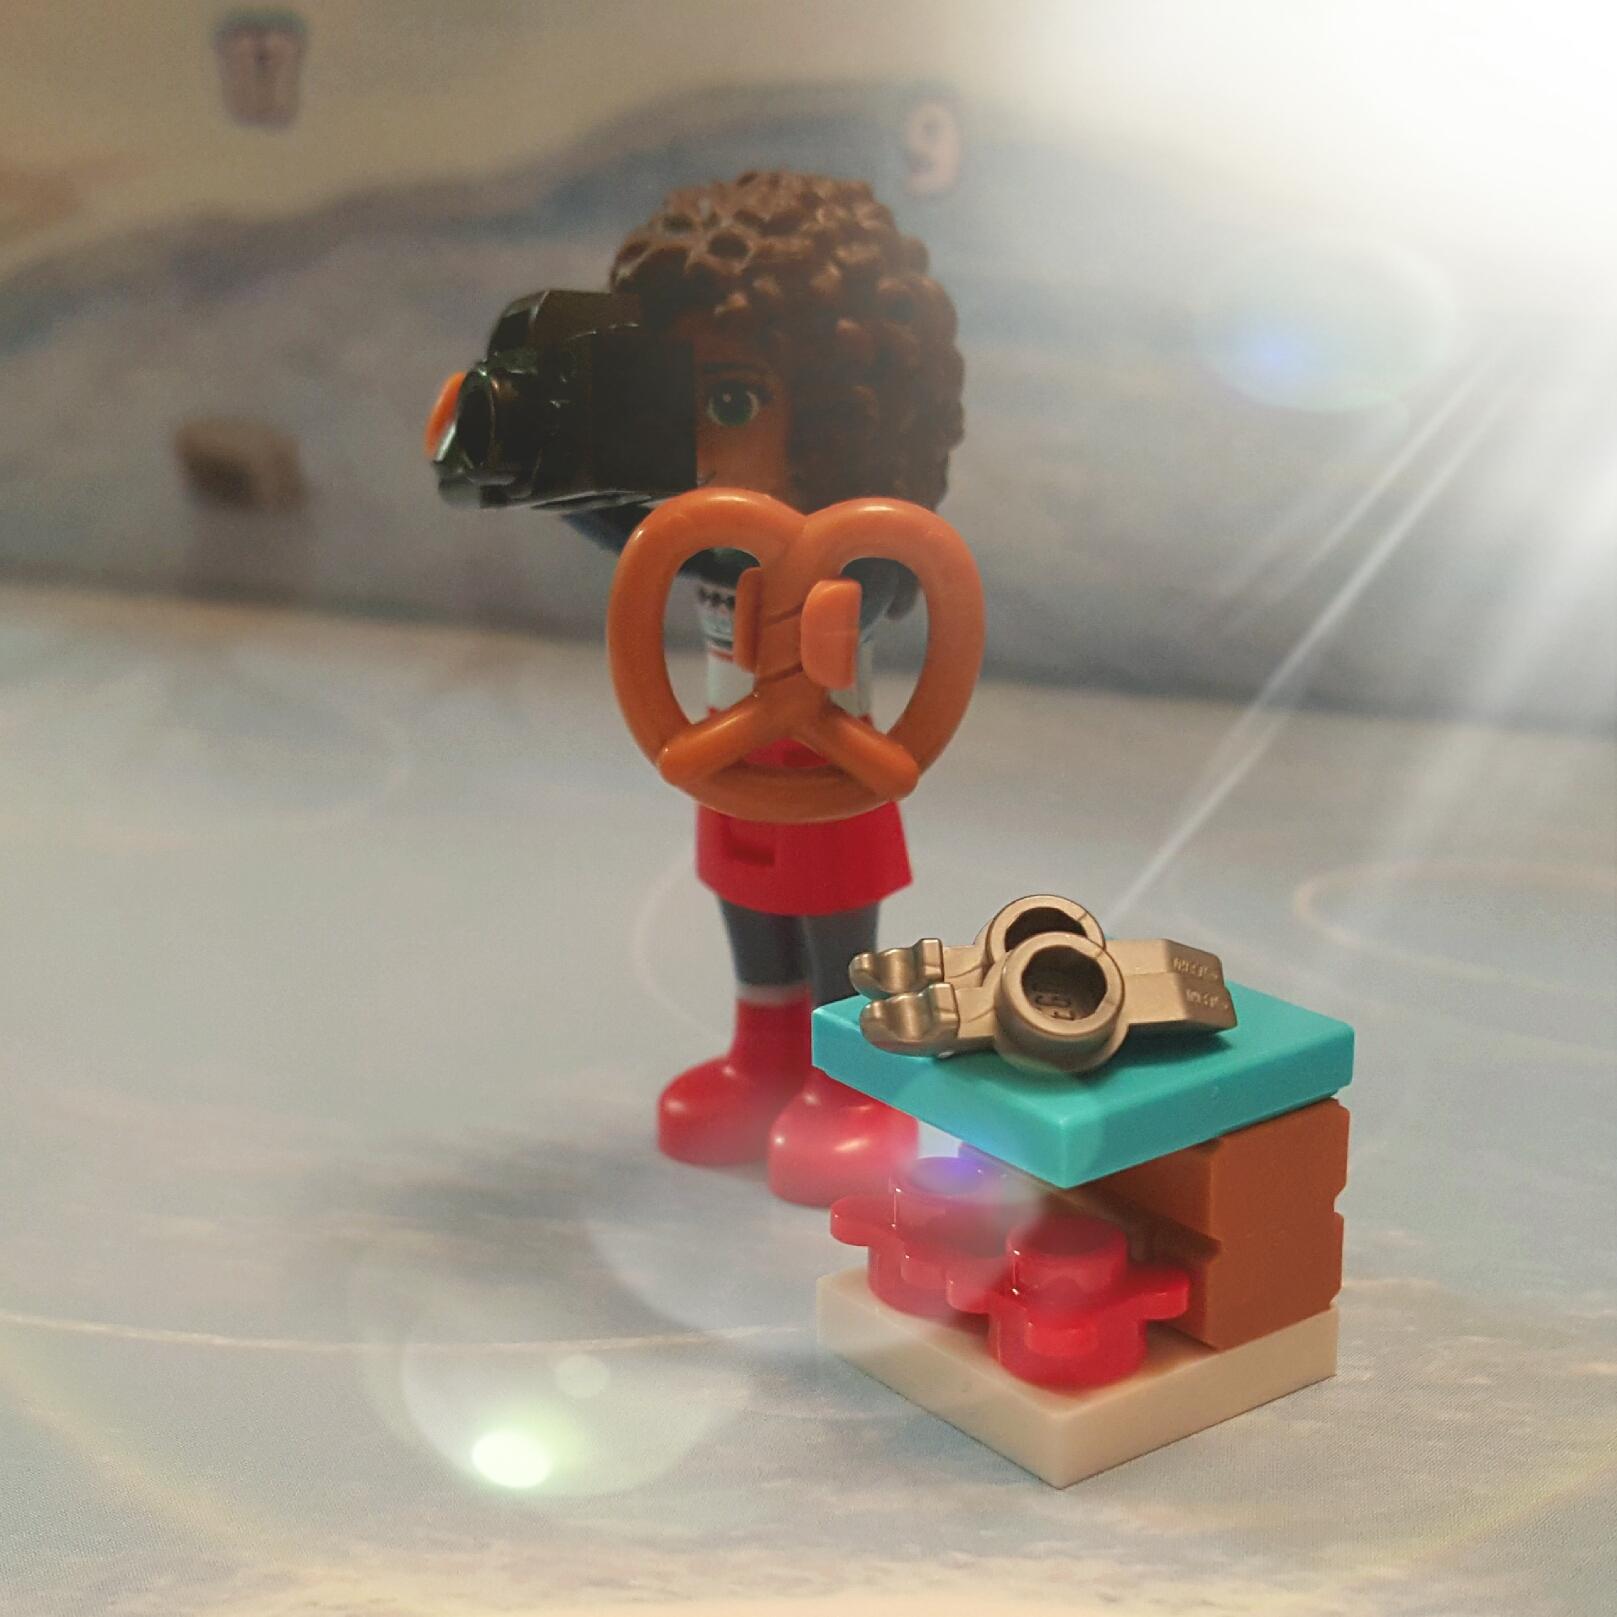 LEGO Friends Advent Calendar 2015 - Day 2 - Bench & Ice Skates